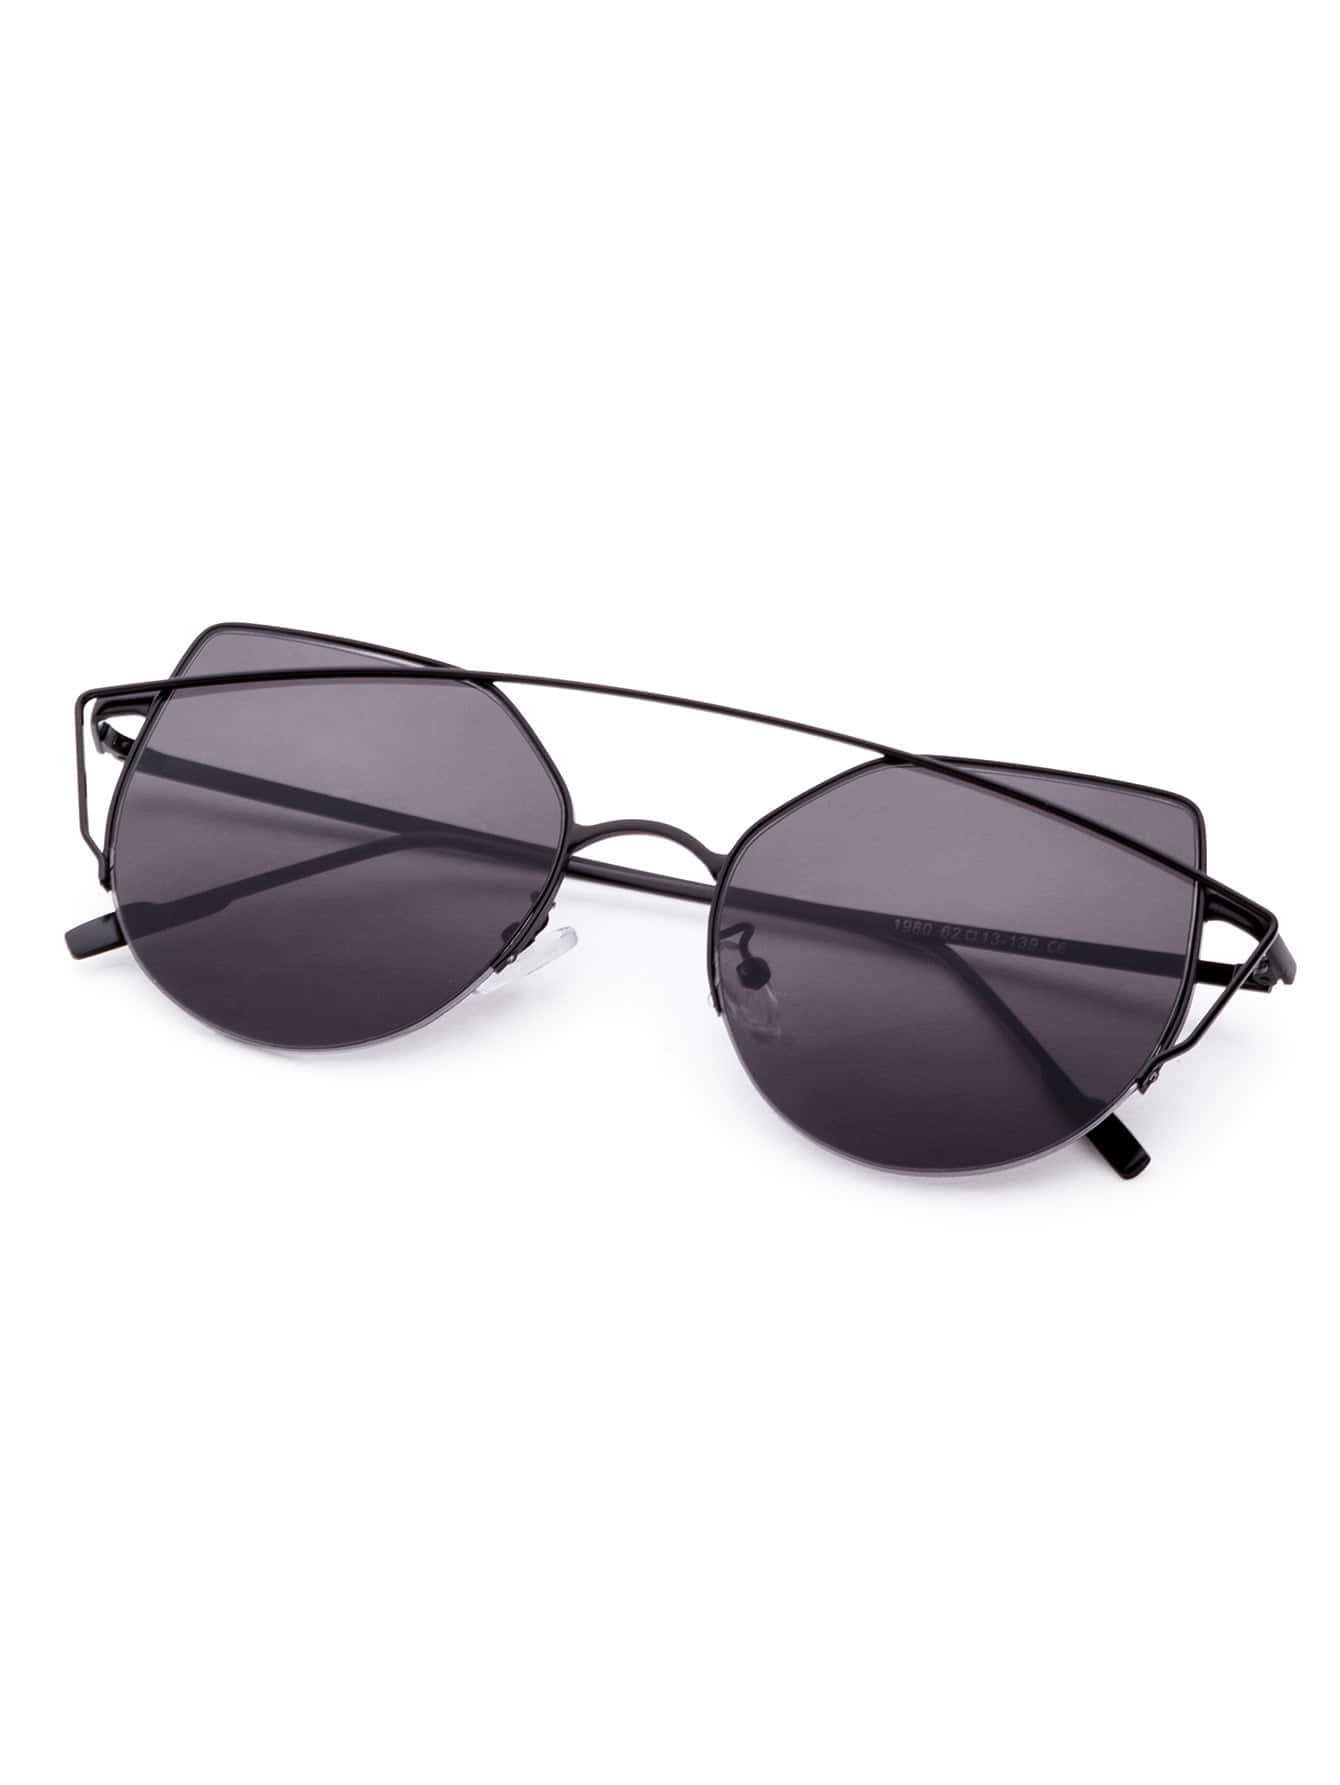 Black Frame Double Bridge Cat Eye Sunglasses -SheIn(Sheinside)